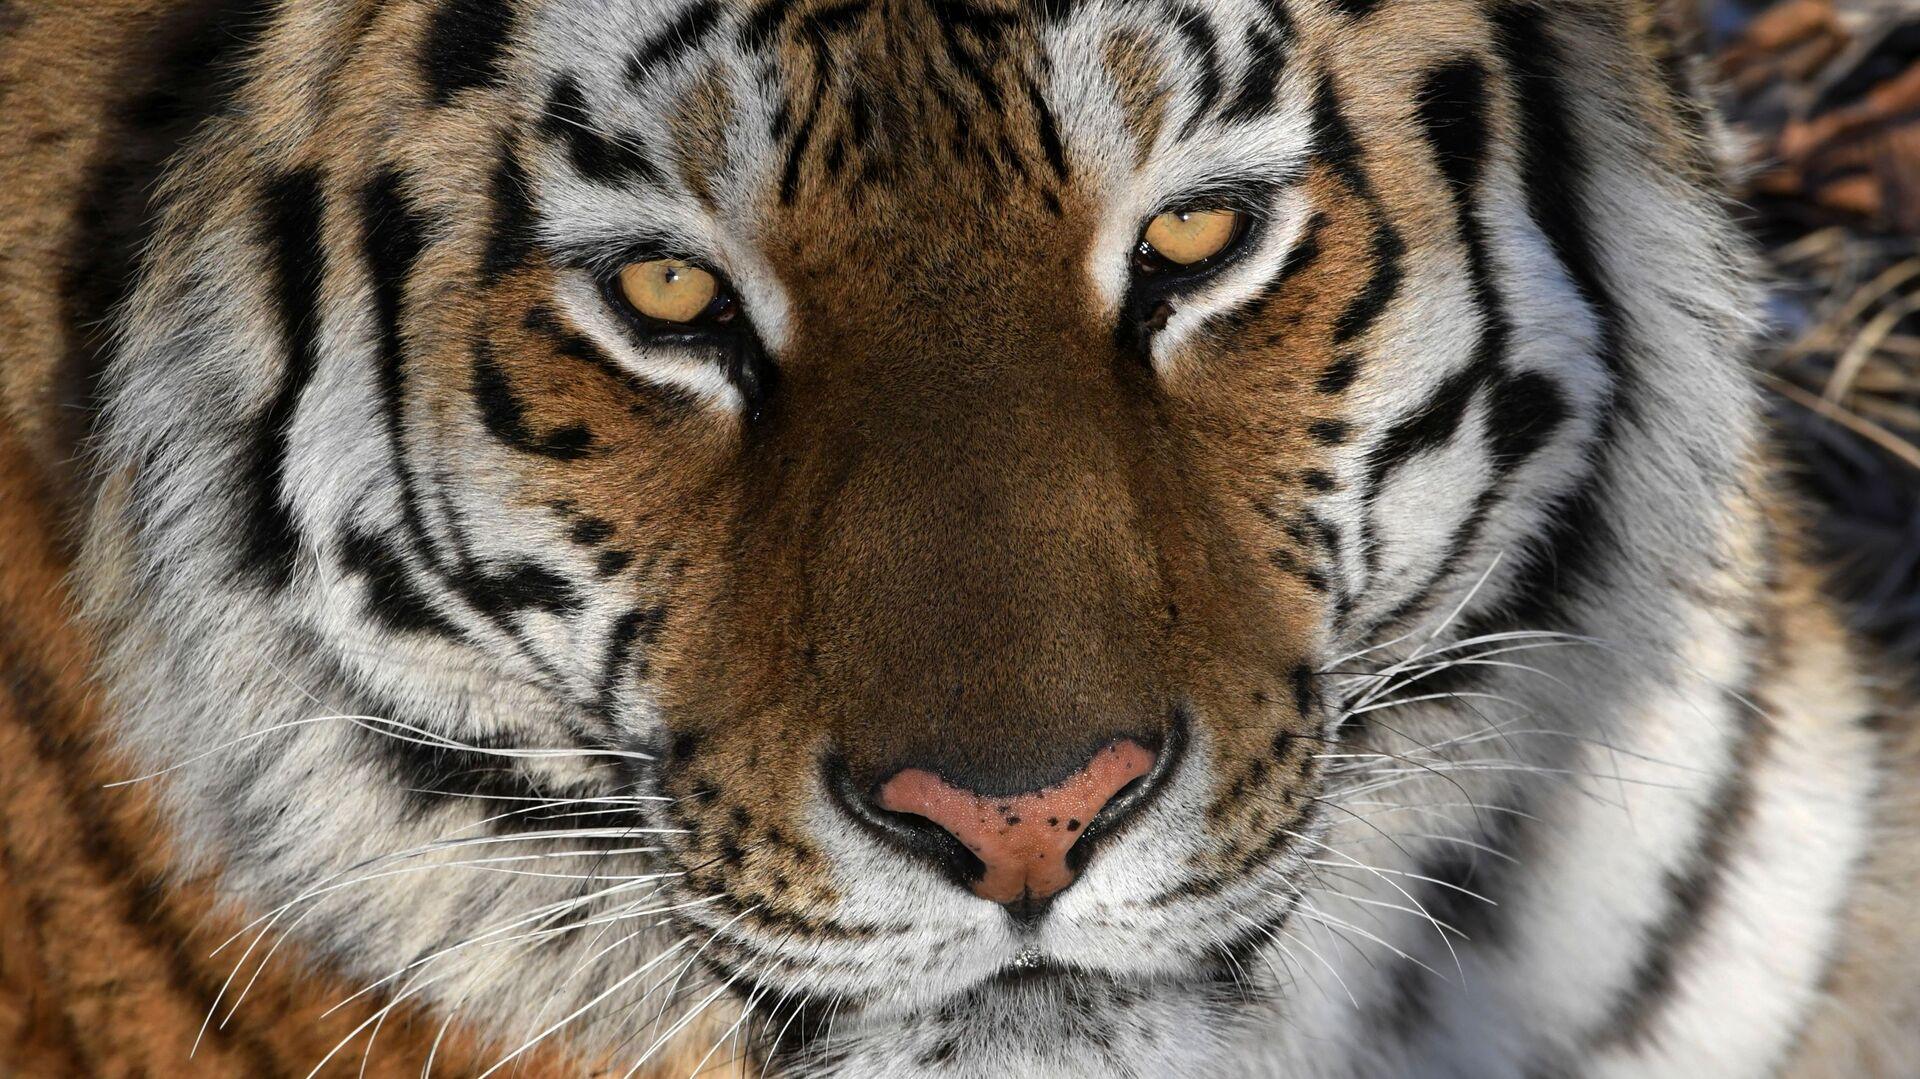 La tigre dell'Amur - Sputnik Italia, 1920, 15.09.2021